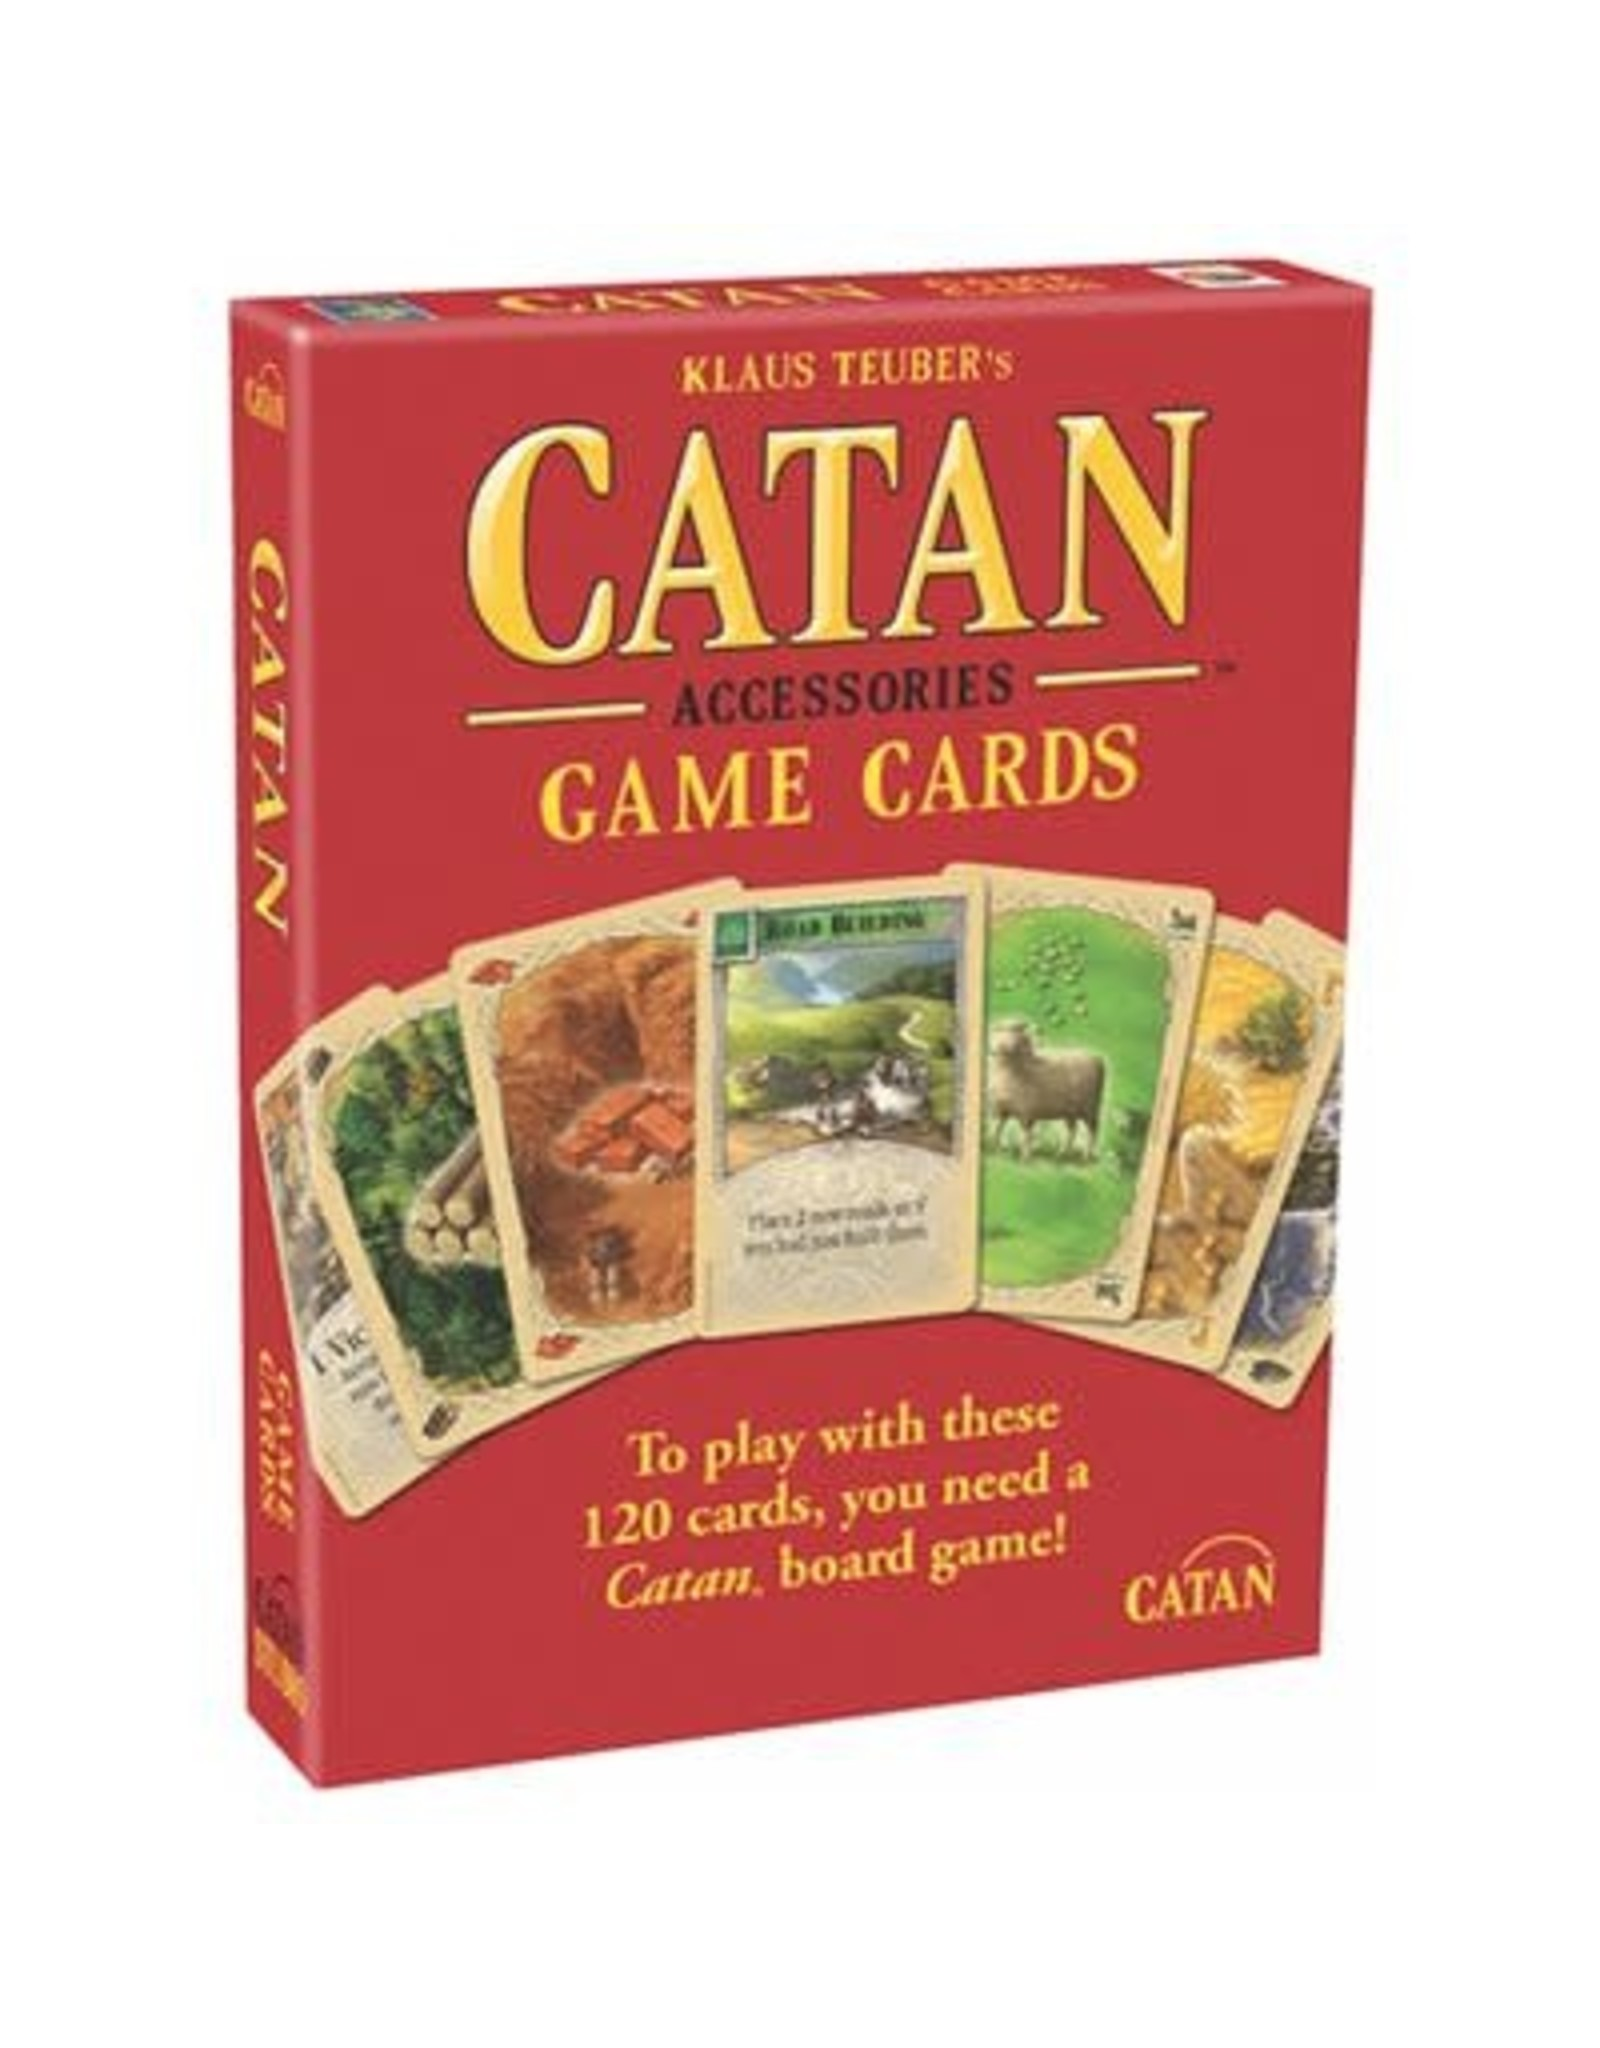 Catan Catan Accessory Base Game Cards